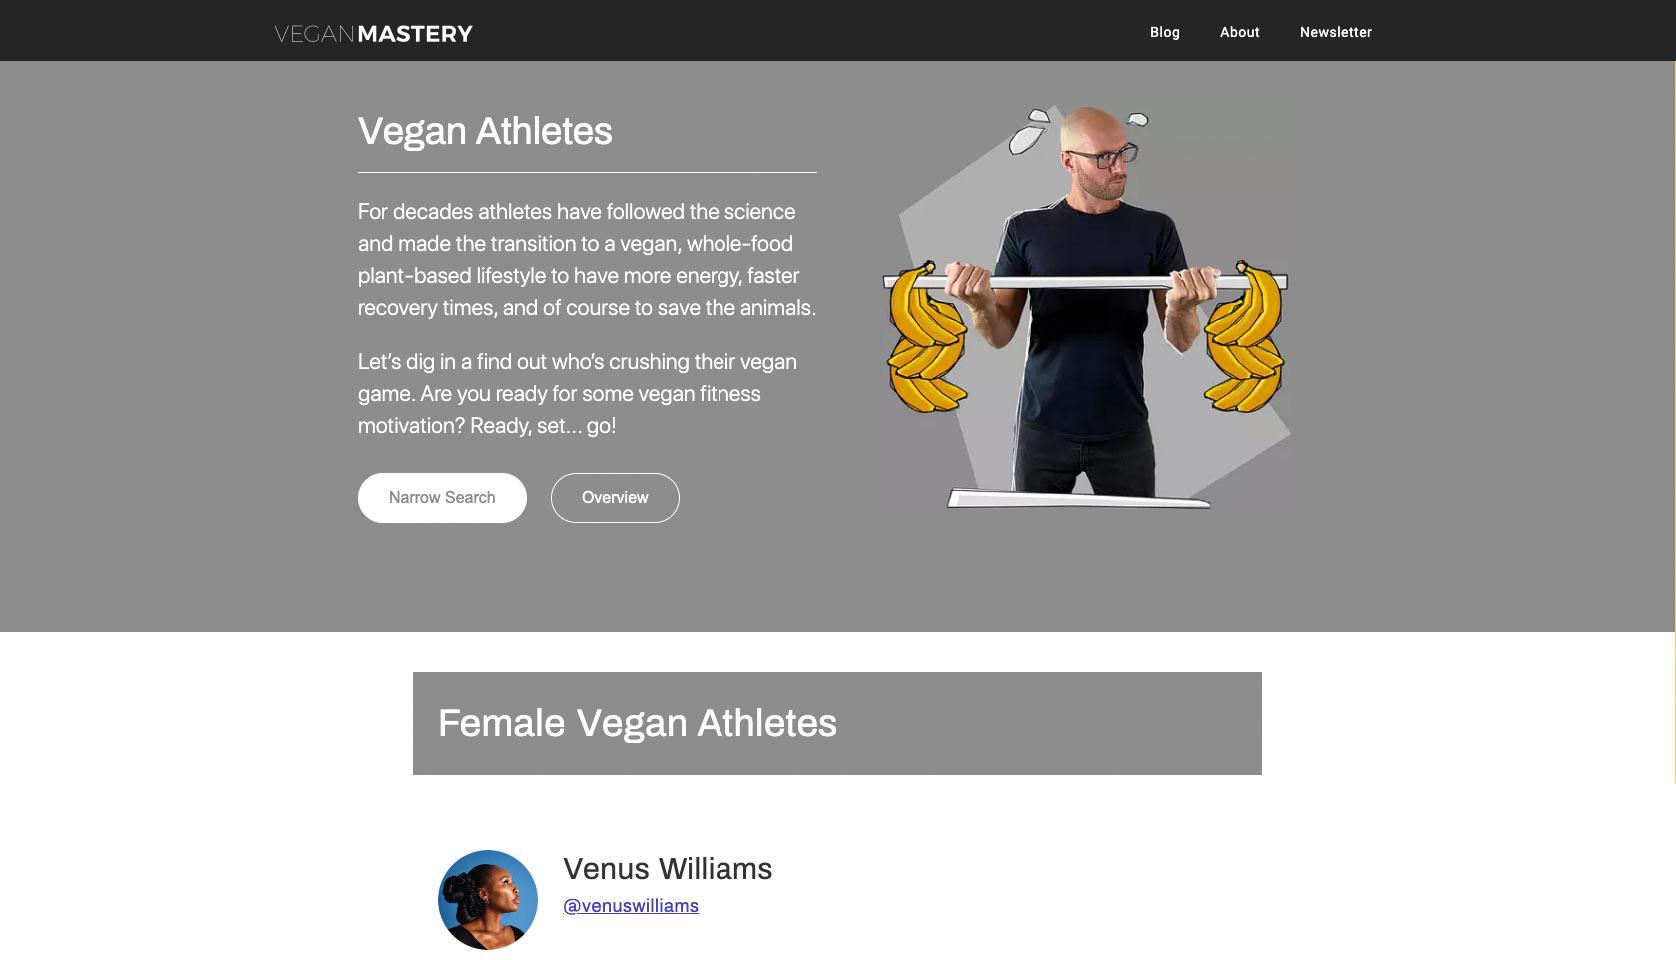 Inspirational vegan Athletes vegan Mastery